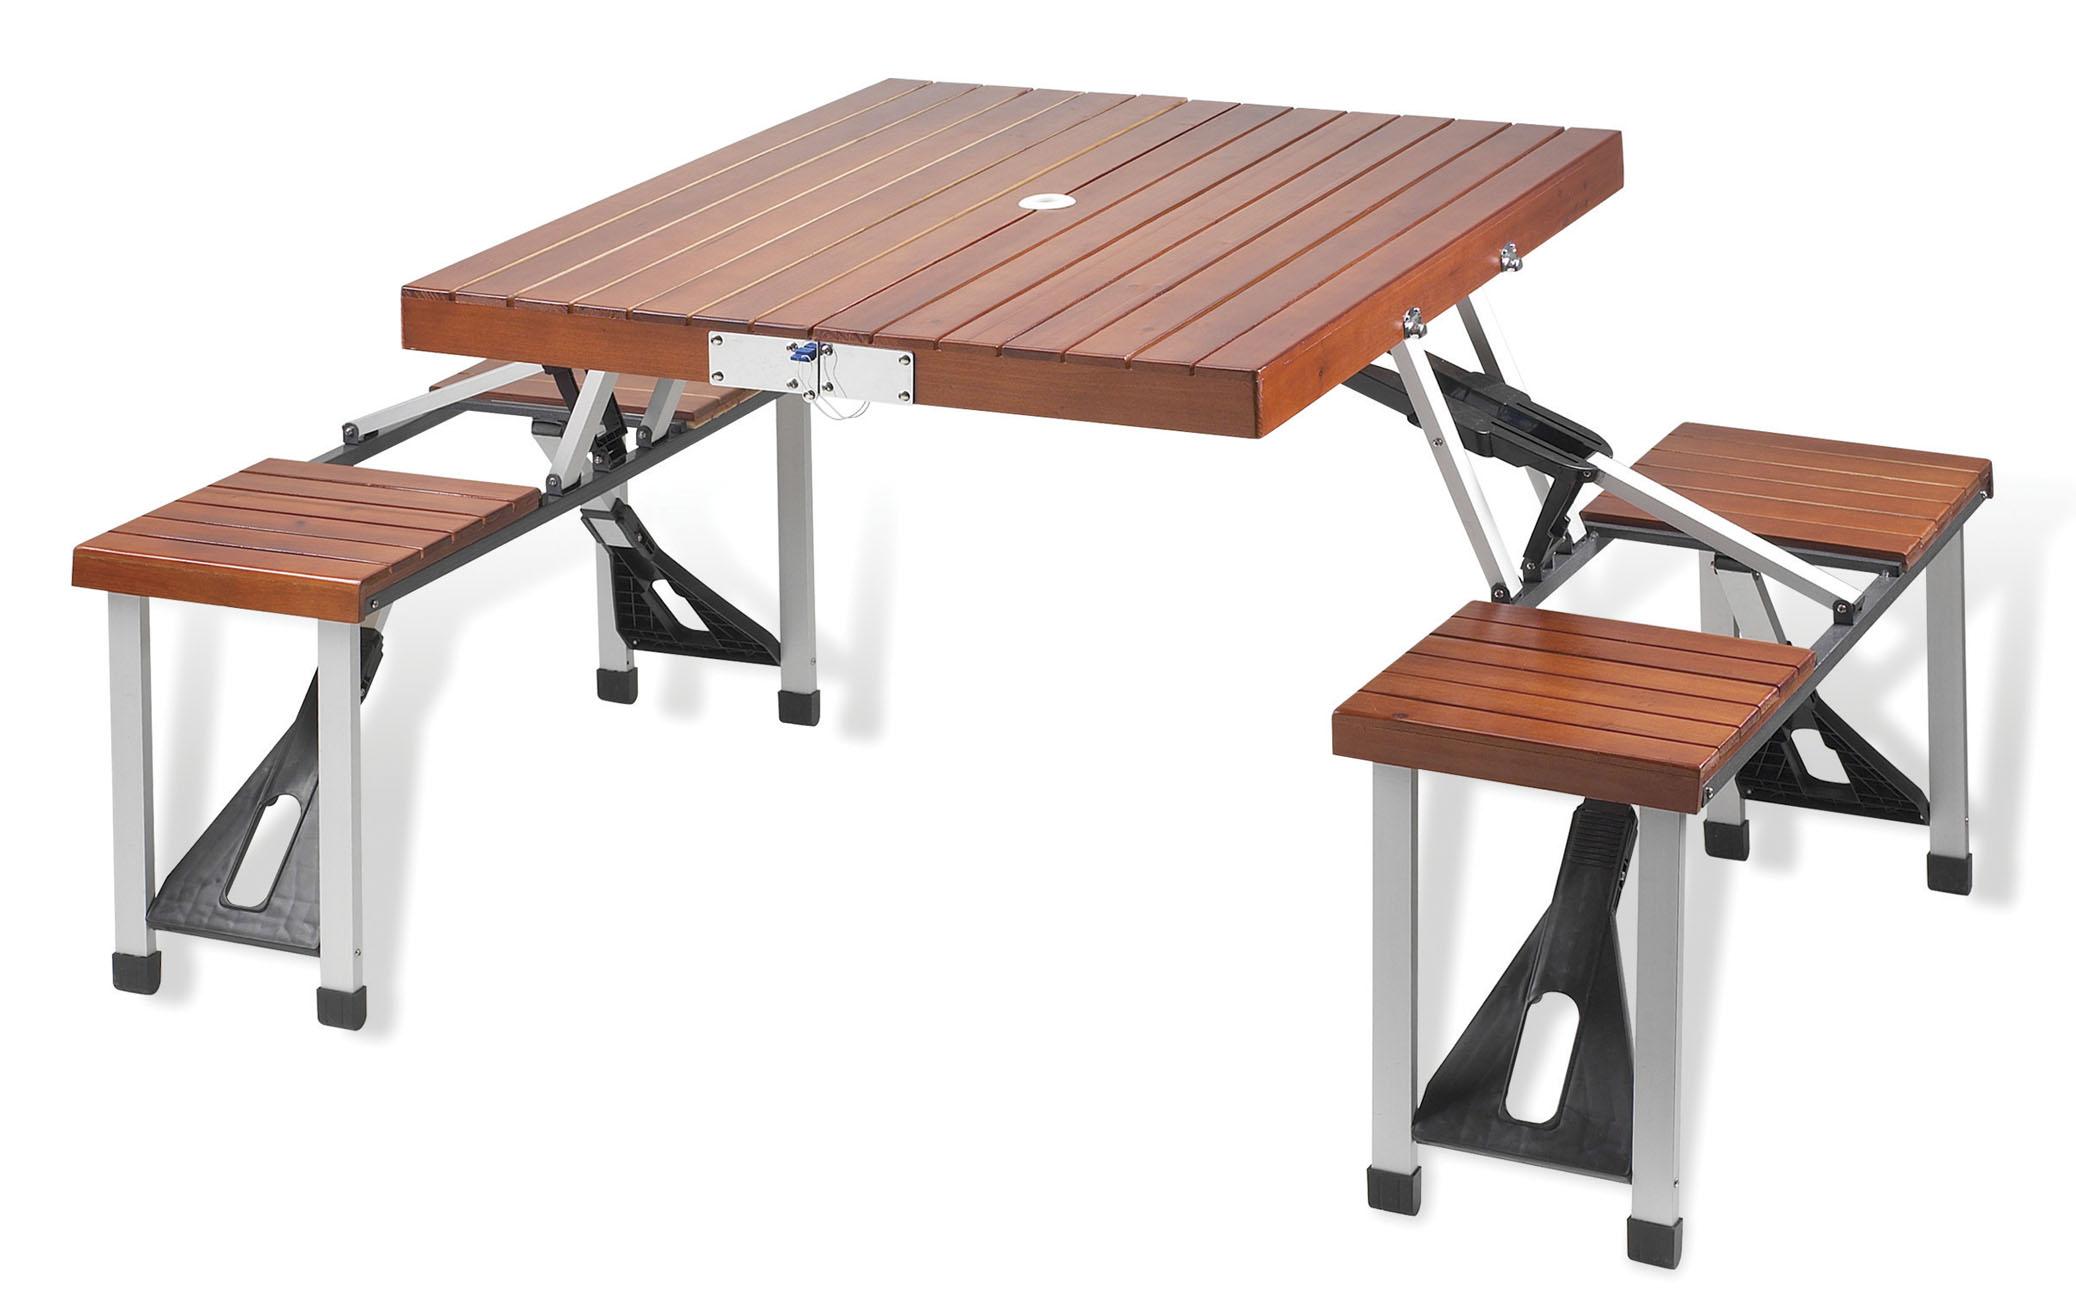 Doyle Marine Marine Supplies Electronics All Kinds Of Marine - Picnic table supplies